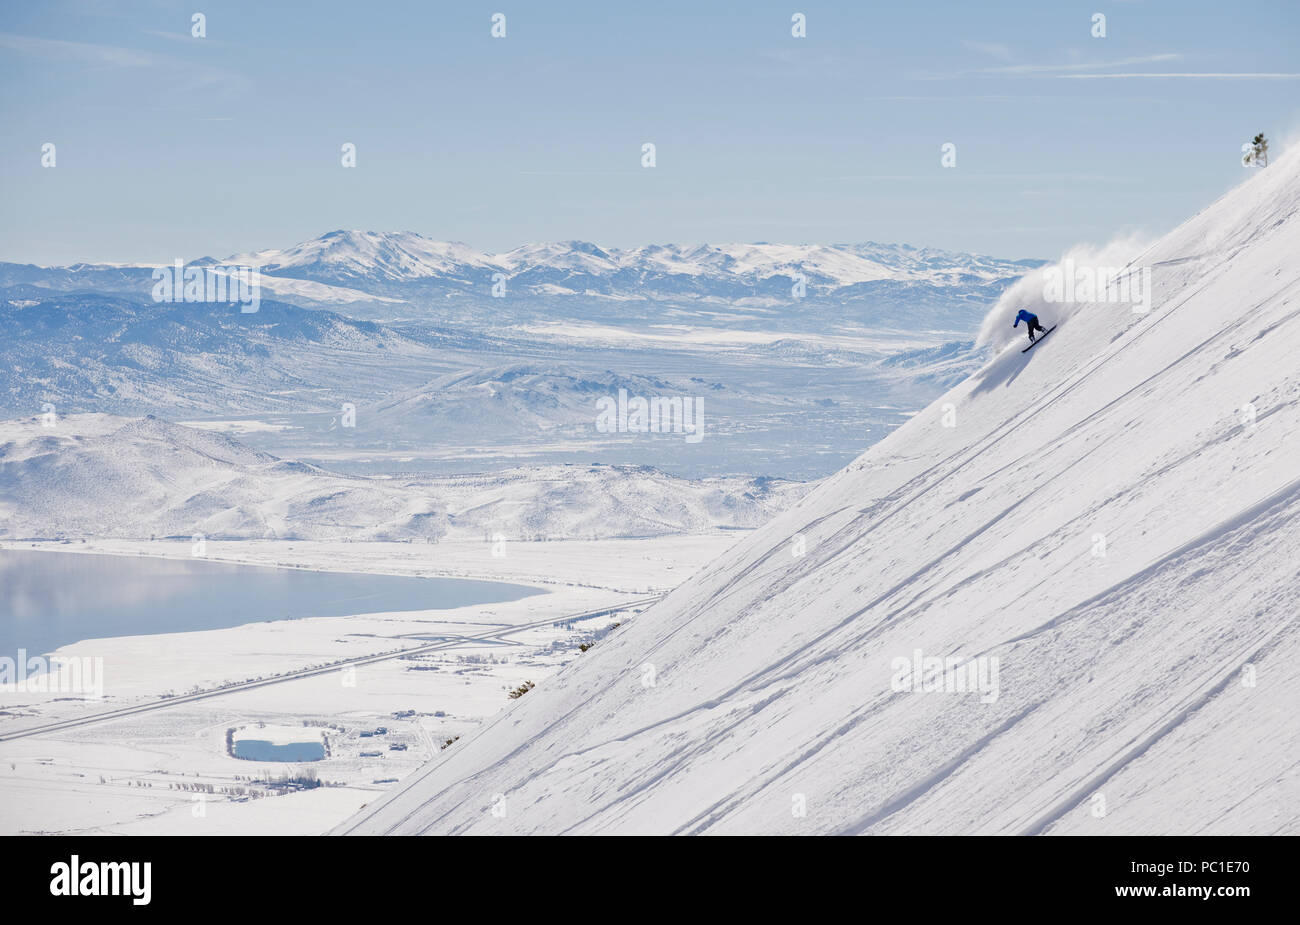 Peter Spain  enjoys 4500 vertical feet of untracked snow on the Davis Creek park run off of Mt. Rose Ski Tahoe. Stock Photo